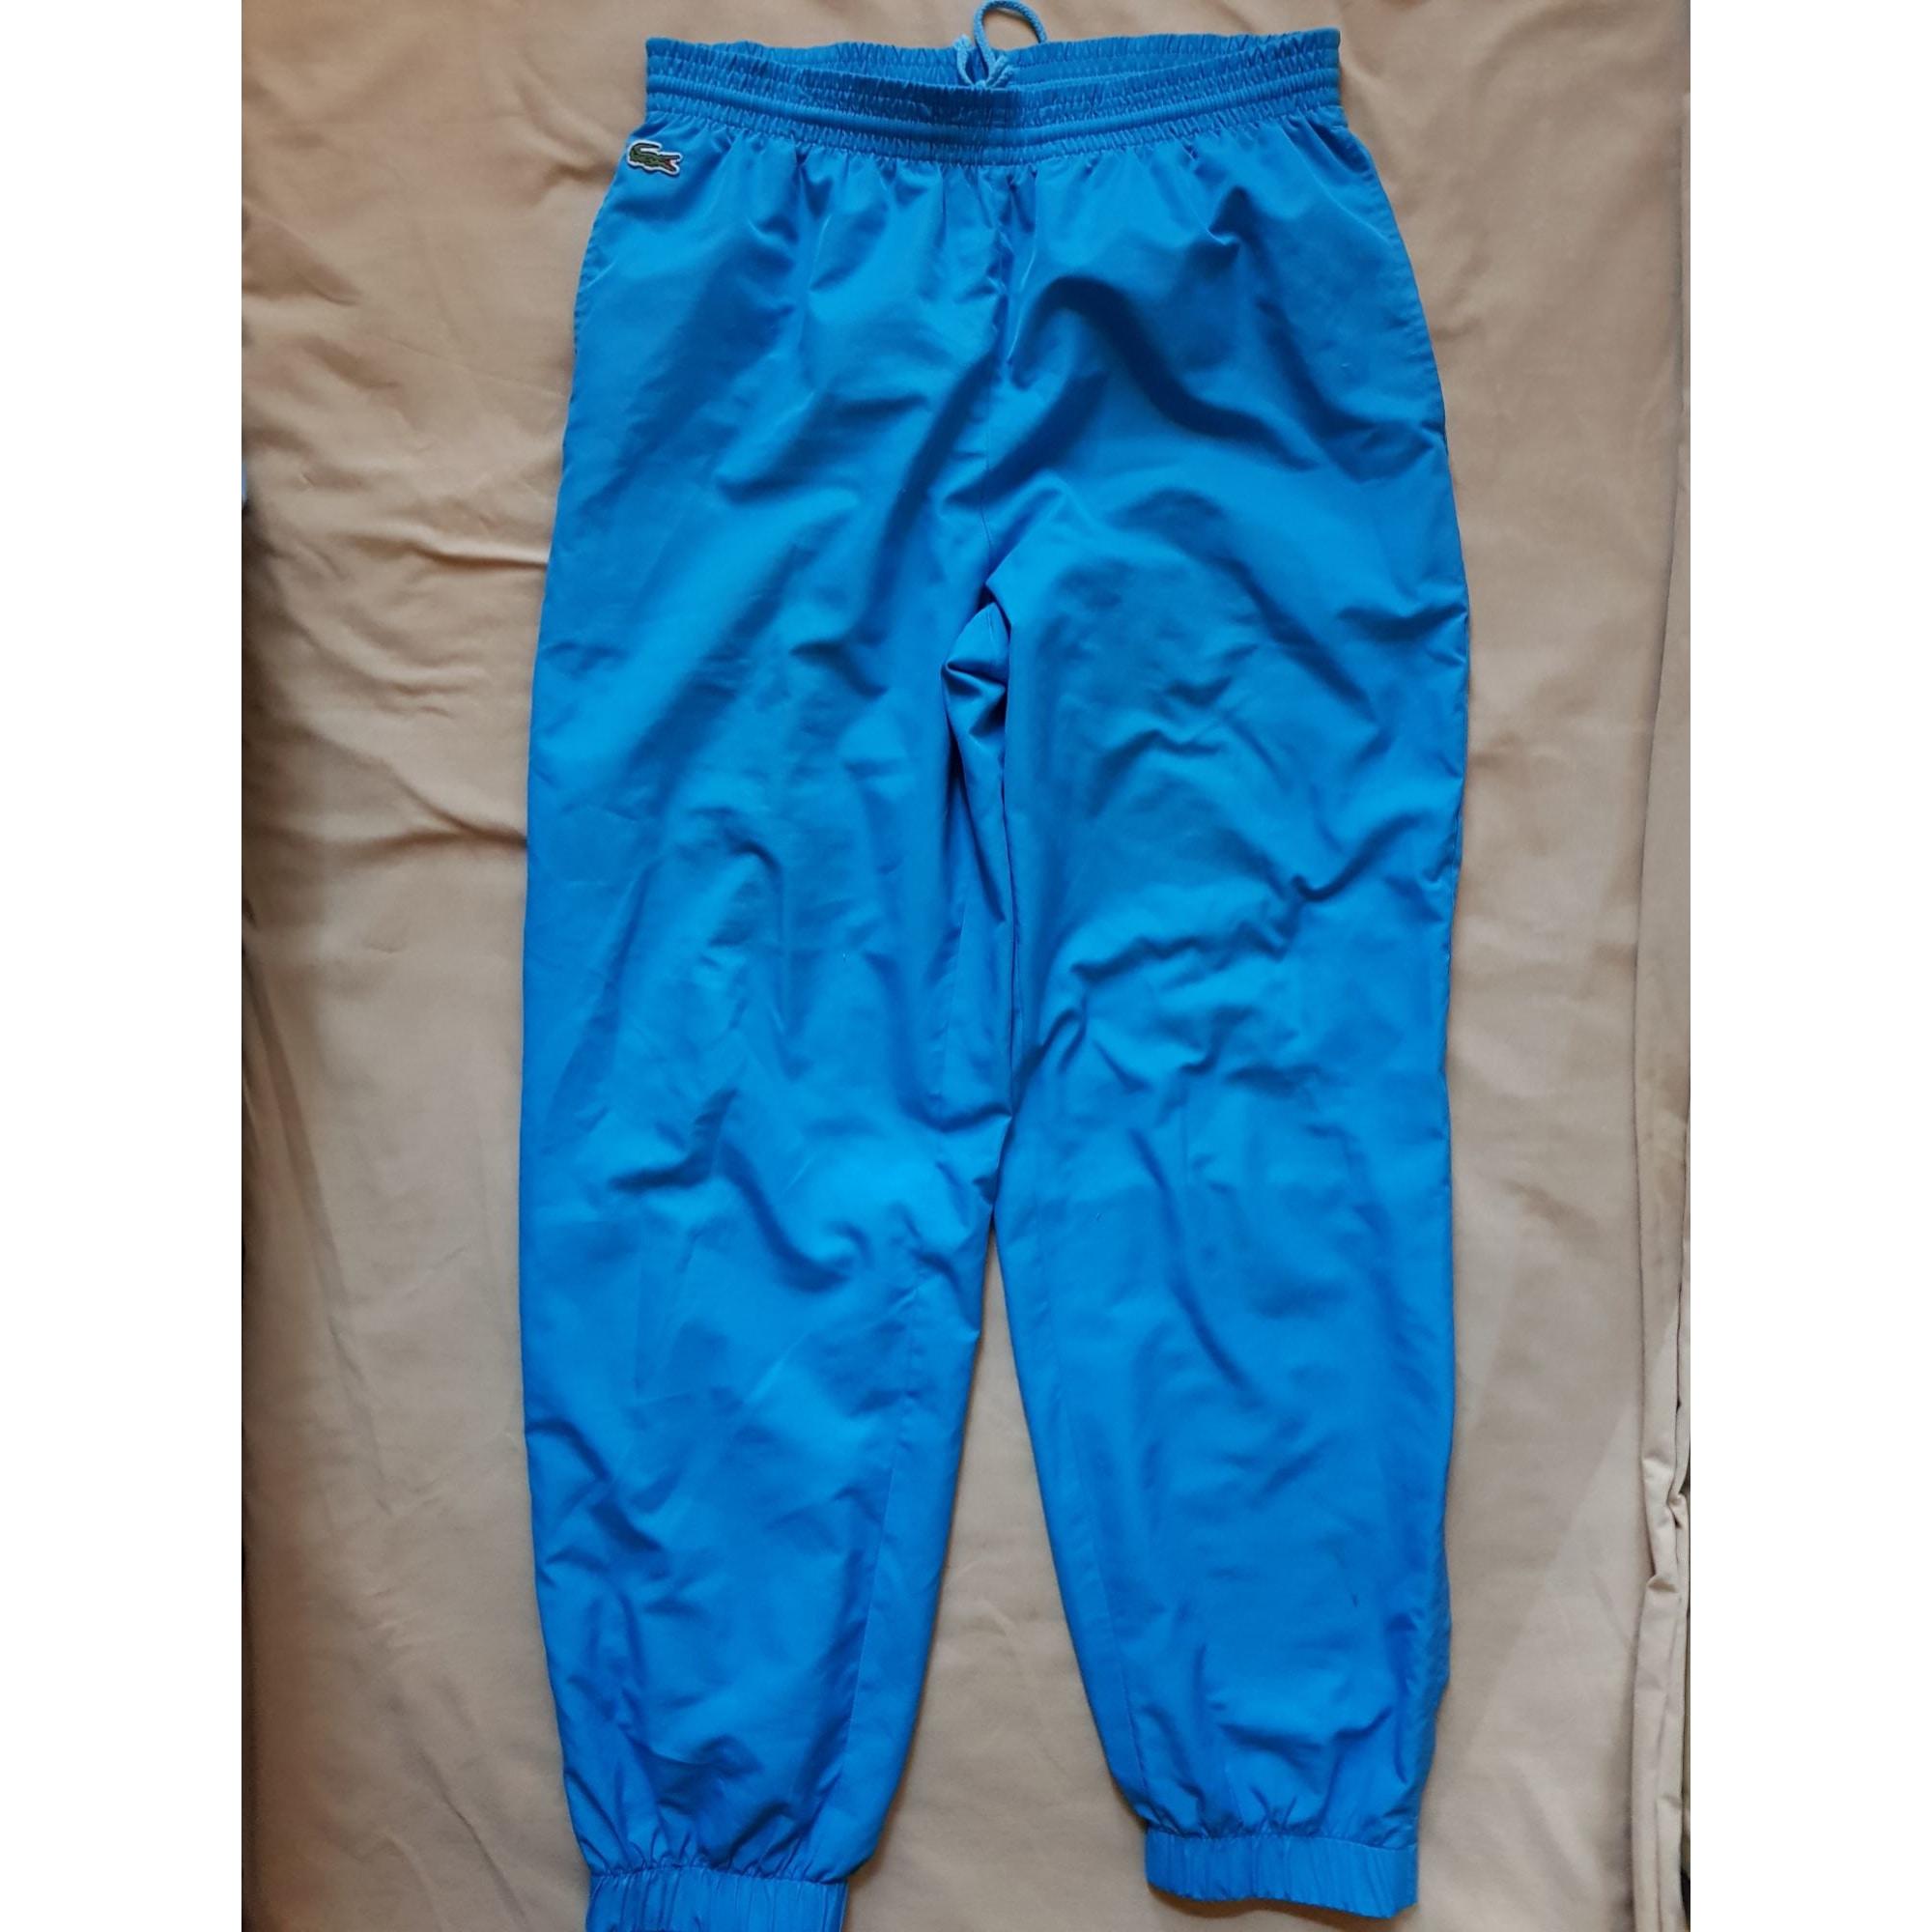 29c8b9ff55 Pantalon de survêtement LACOSTE Bleu, bleu marine, bleu turquoise